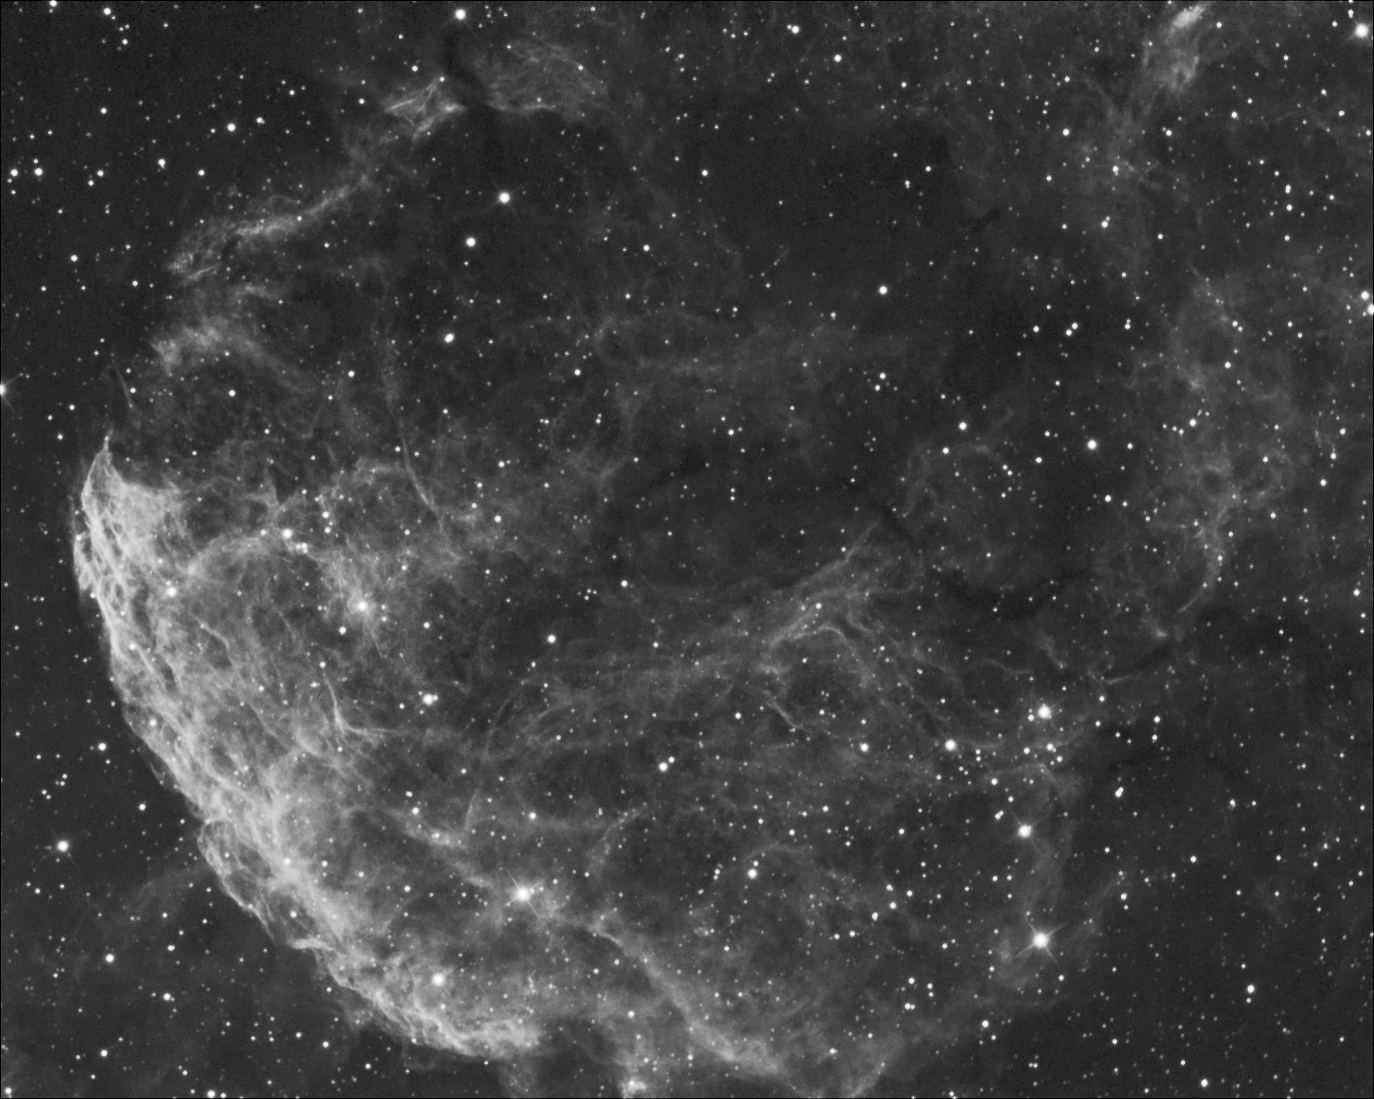 brute DSS n2 IC443 RC8 CCDT67  240S -14°c BLIEUX  PS6  2.png